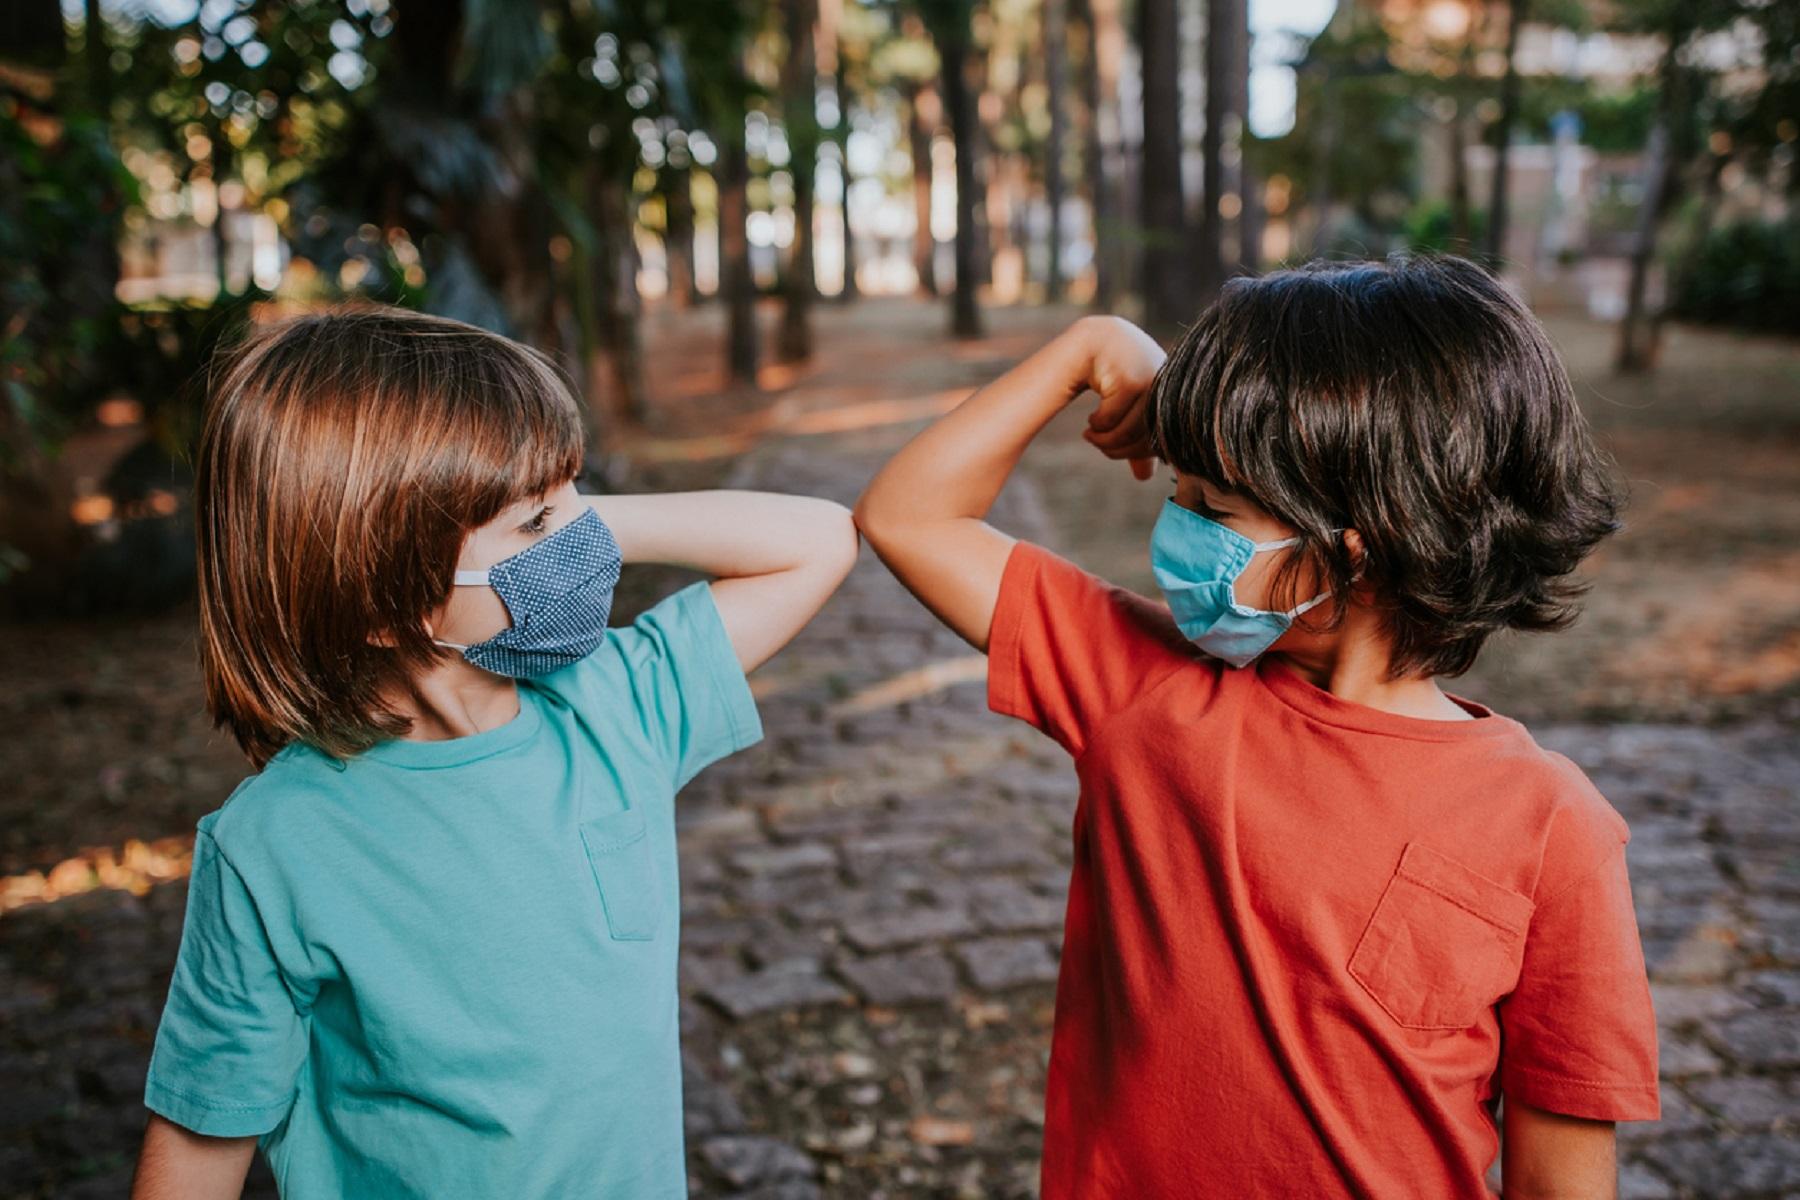 Antony Fauci: H καθοδήγηση των CDC για τις καλοκαιρινές κατασκηνώσεις «φαίνεται λίγο αυστηρή»